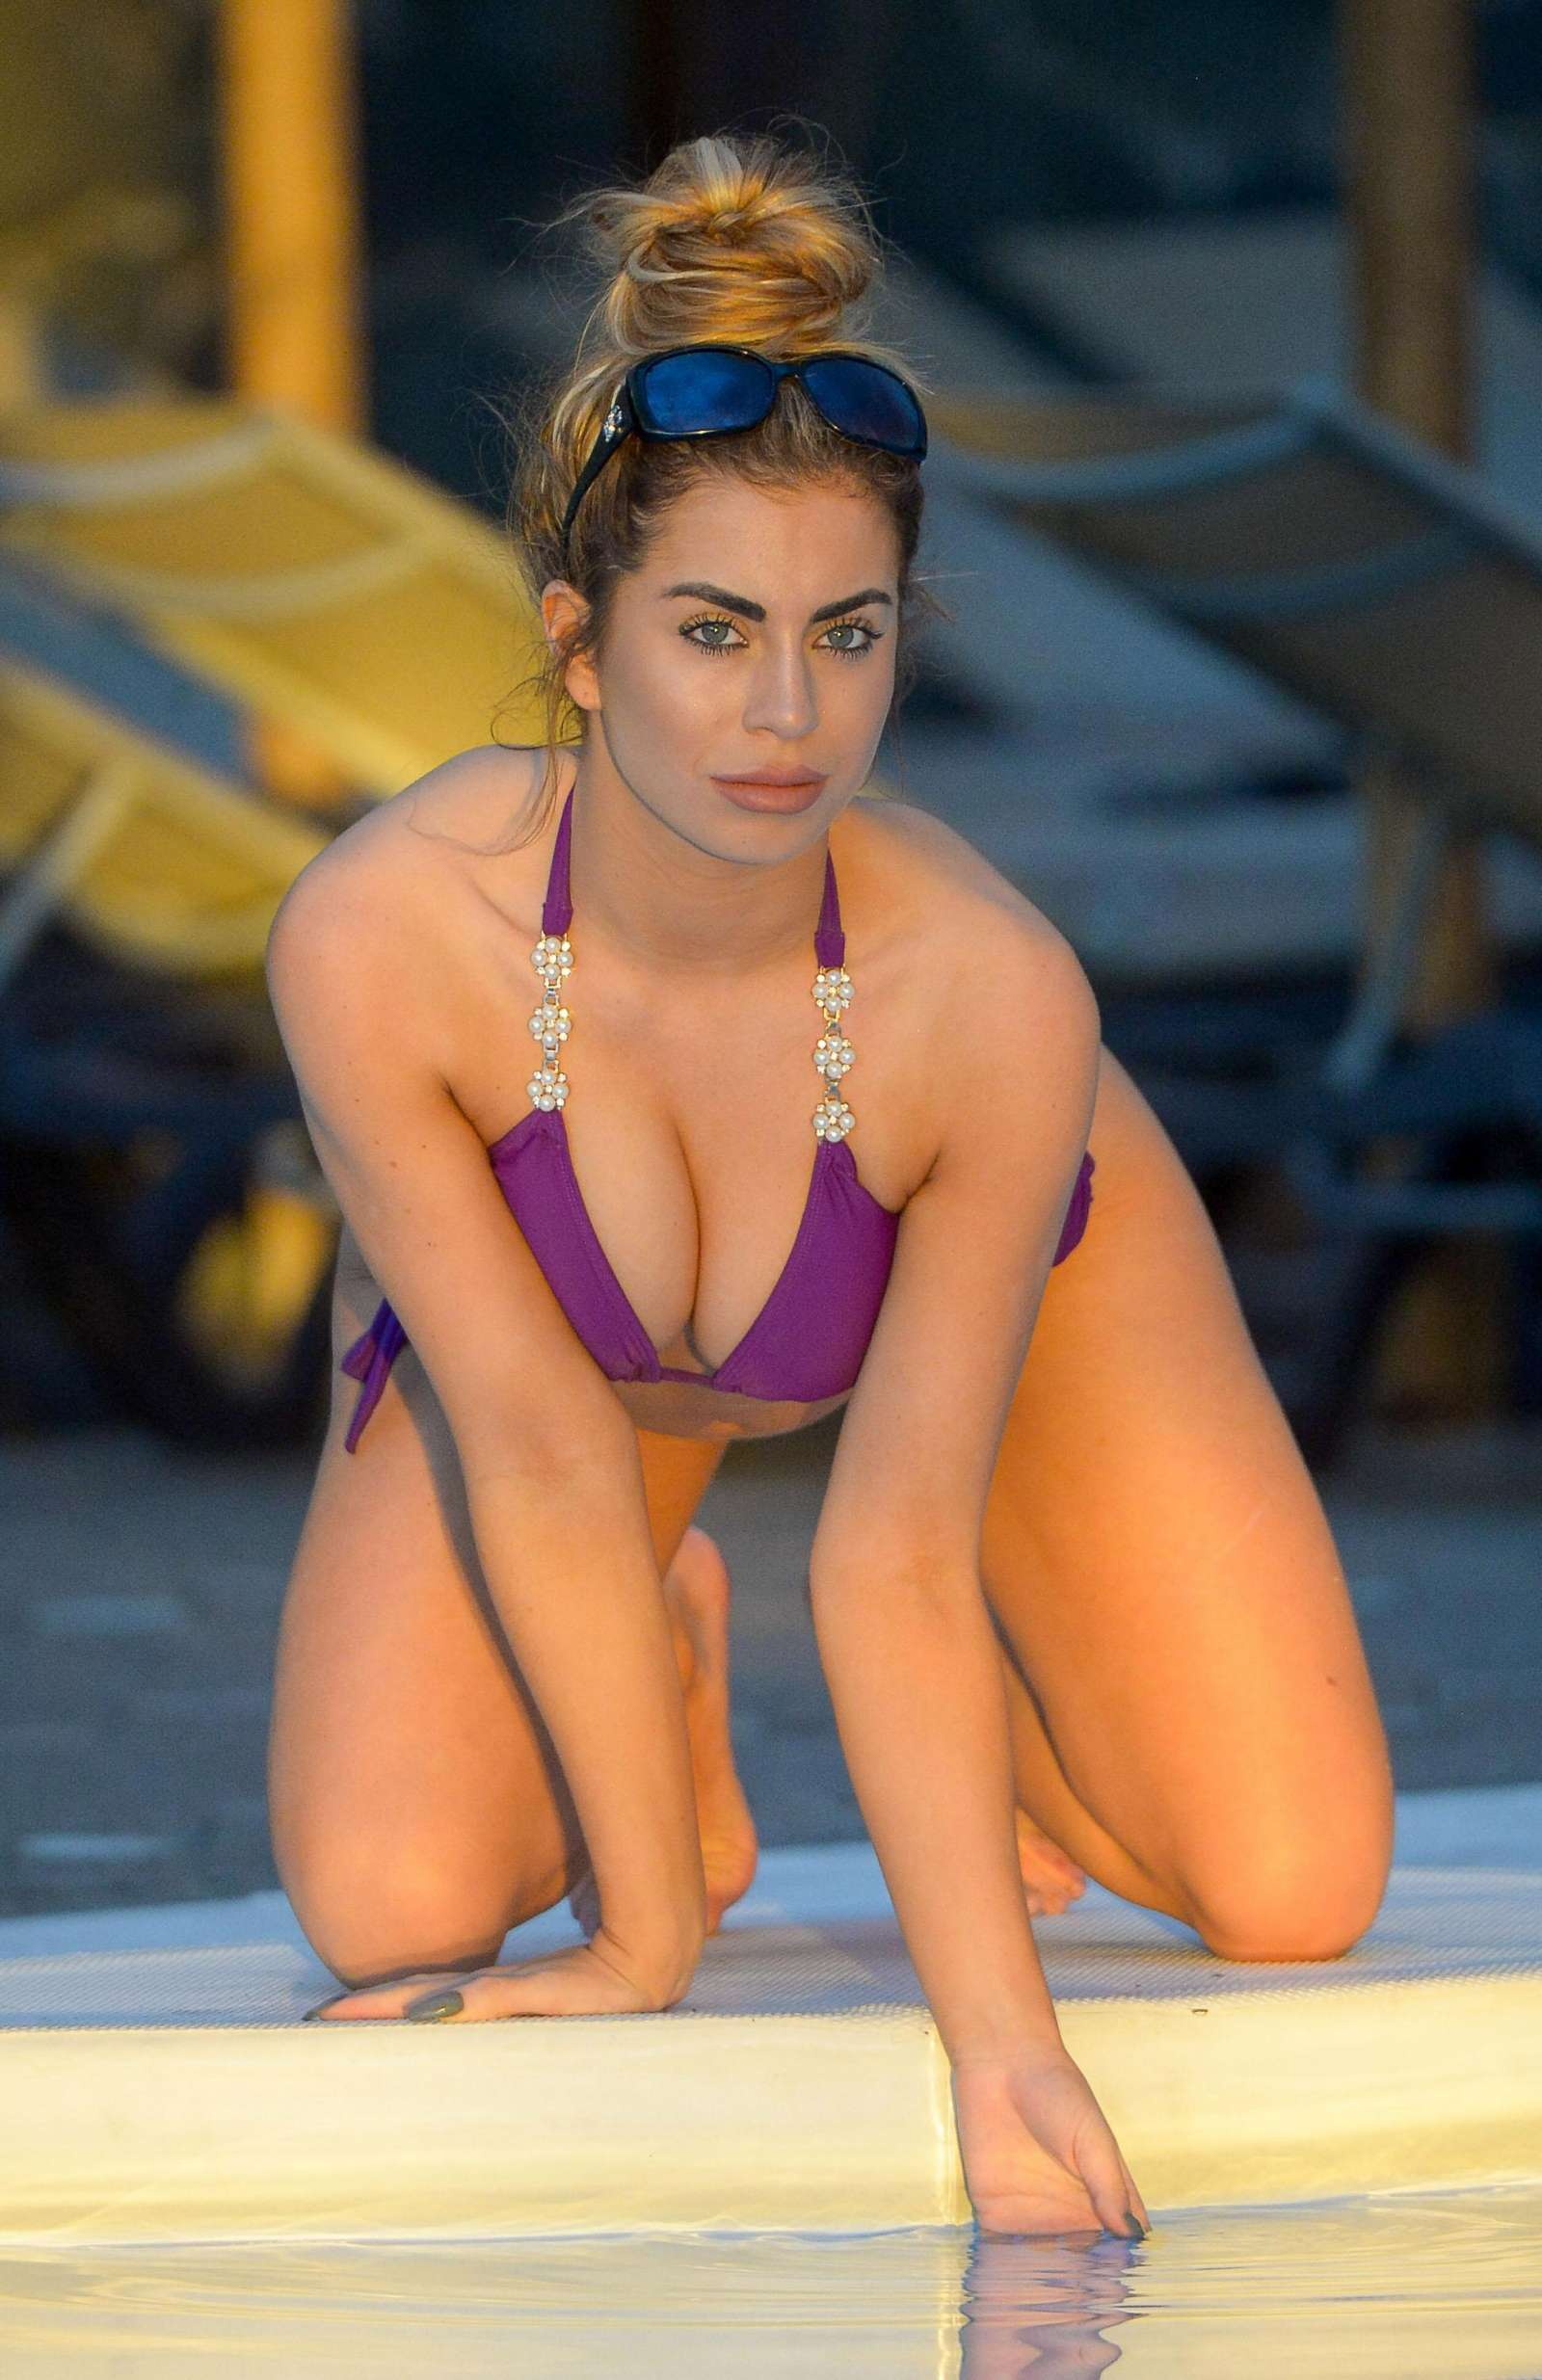 Photos Danielle Whittaker nudes (34 photos), Topless, Is a cute, Twitter, in bikini 2015